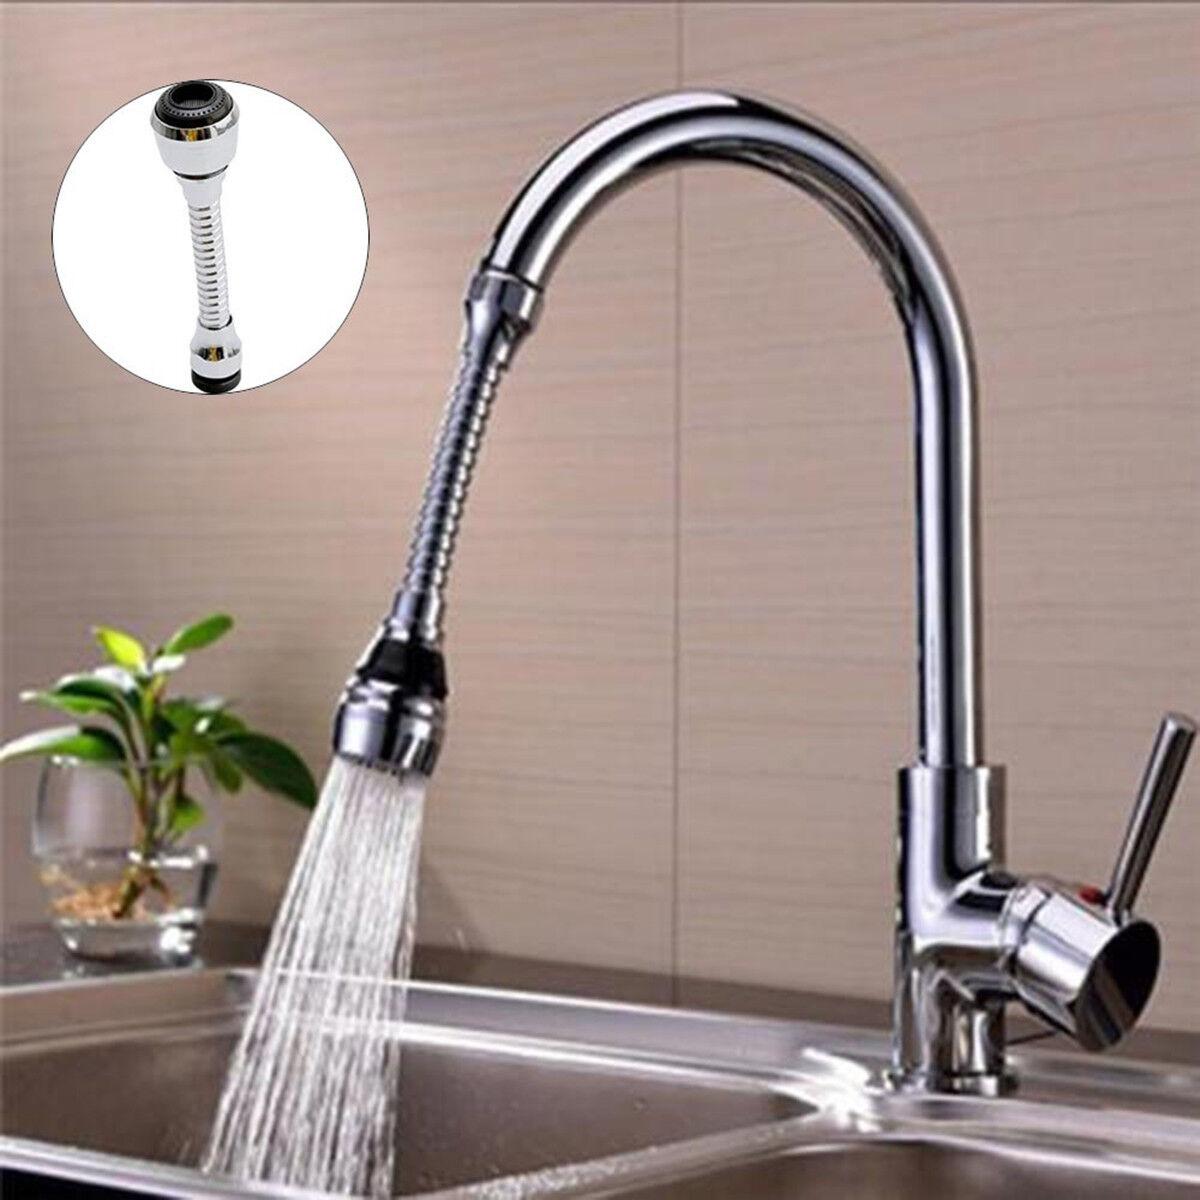 Water Saving Nozzle Filter Adapter Inheming Flexible Faucet Sprayer Tap 360 /° Flexible Hose Extension Kitchen Sink Universal Faucet Aerator